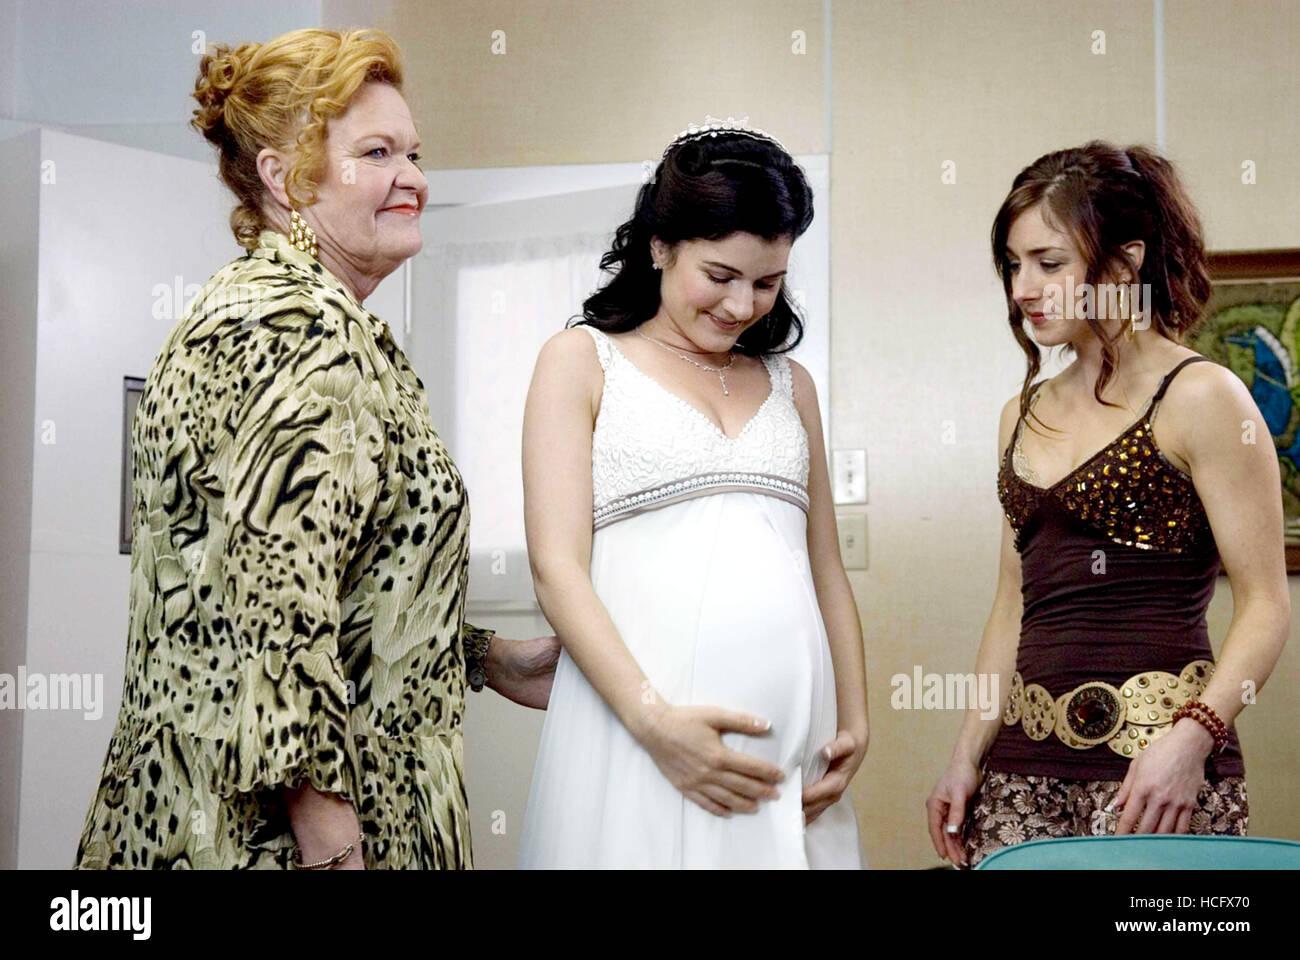 Jeannette Charles,Lydia Cornell Sex pics & movies Andrea Howard,Jennifer Capriati 3 Grand Slam singles titles